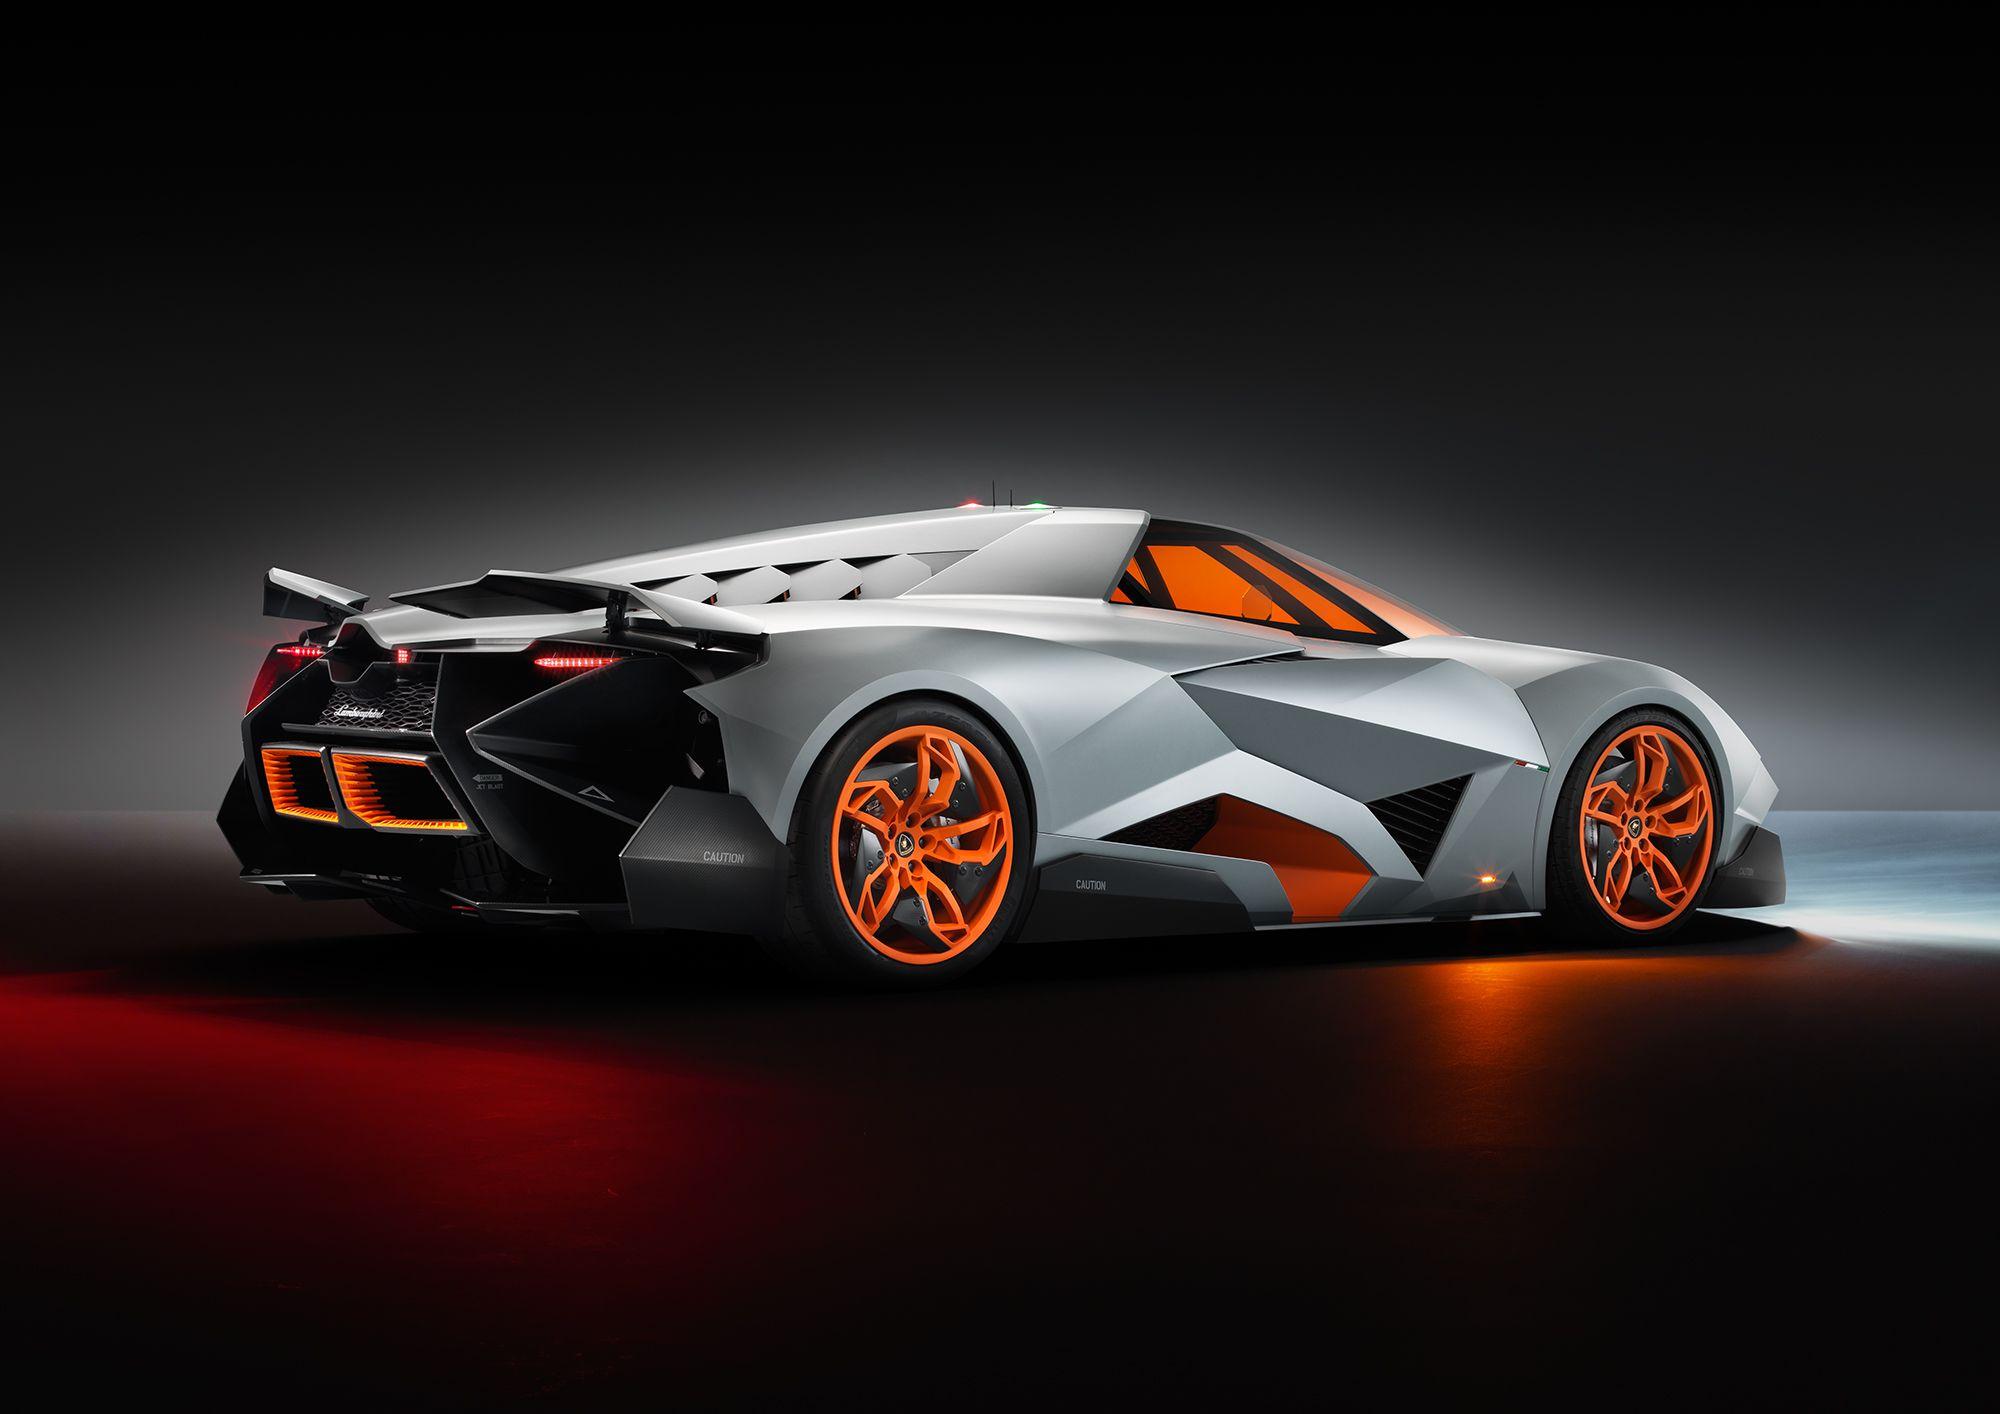 Lets Go To Csr Racing 2 Generator Site New Csr Racing 2 Hack Online Real Works Www Generator Cluehack Com You Ca Lamborghini Egoista Super Cars Sports Car